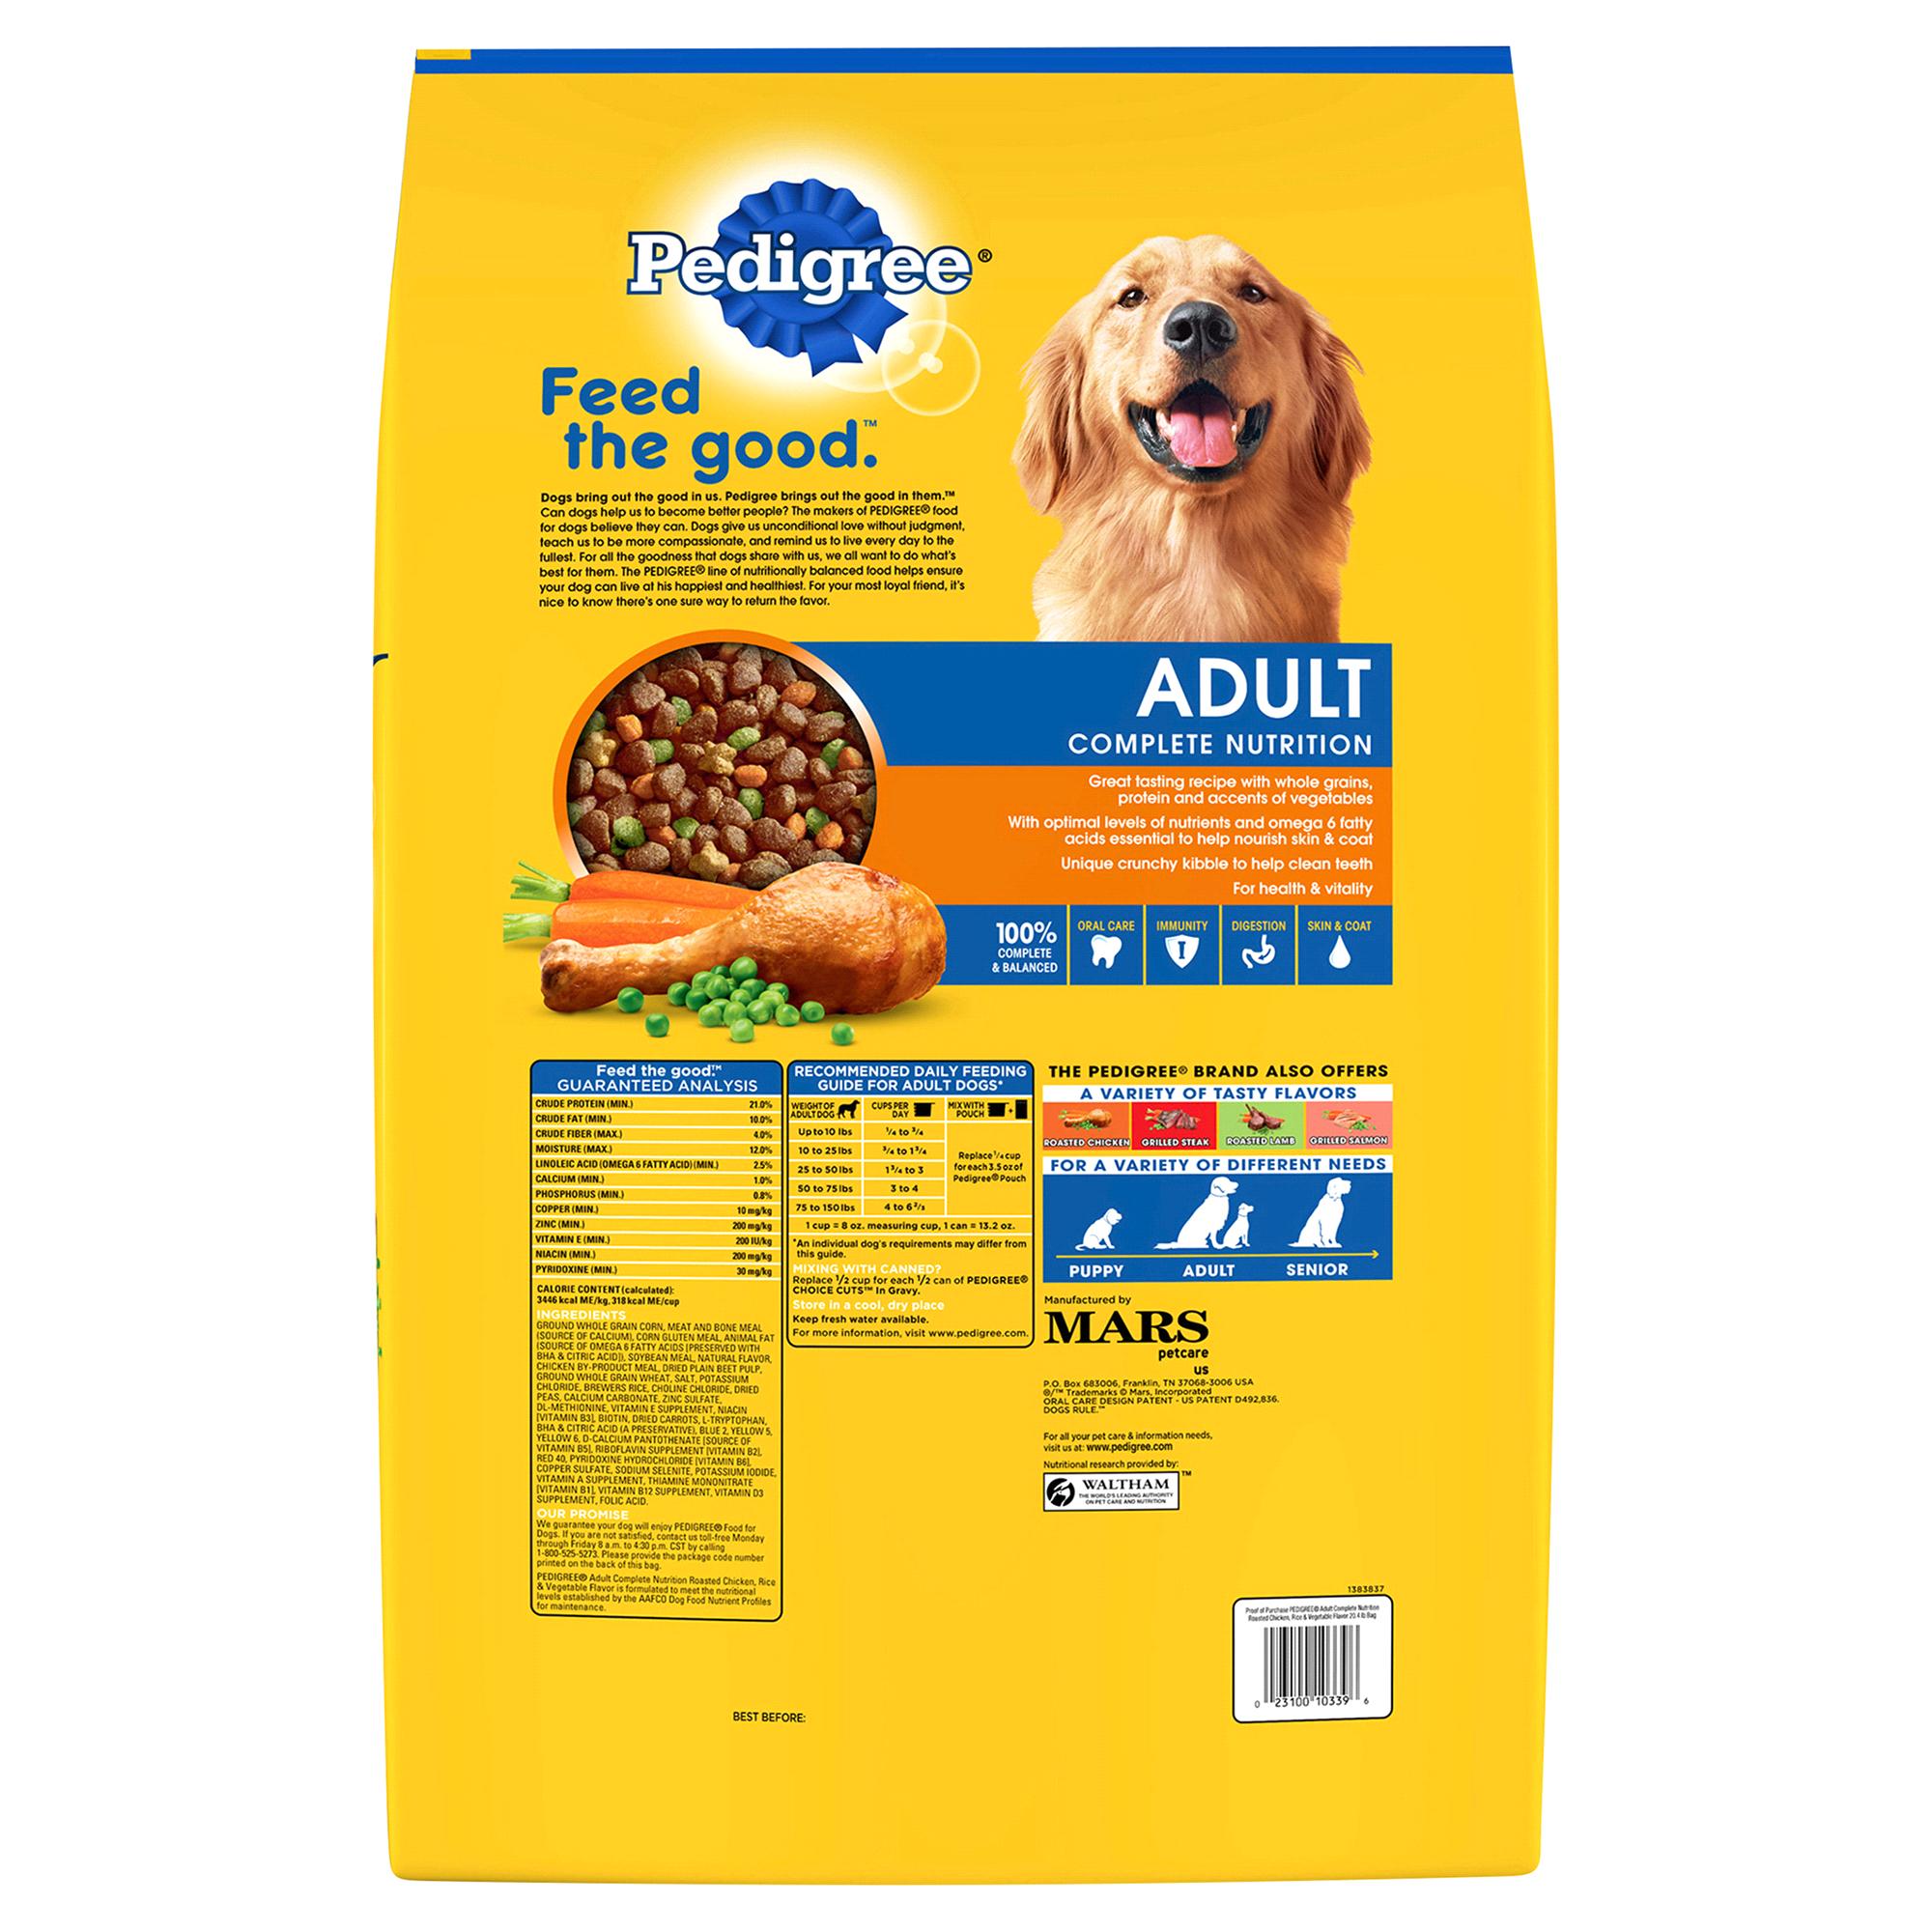 Is Pedigree Dog Food Bad For Your Dog